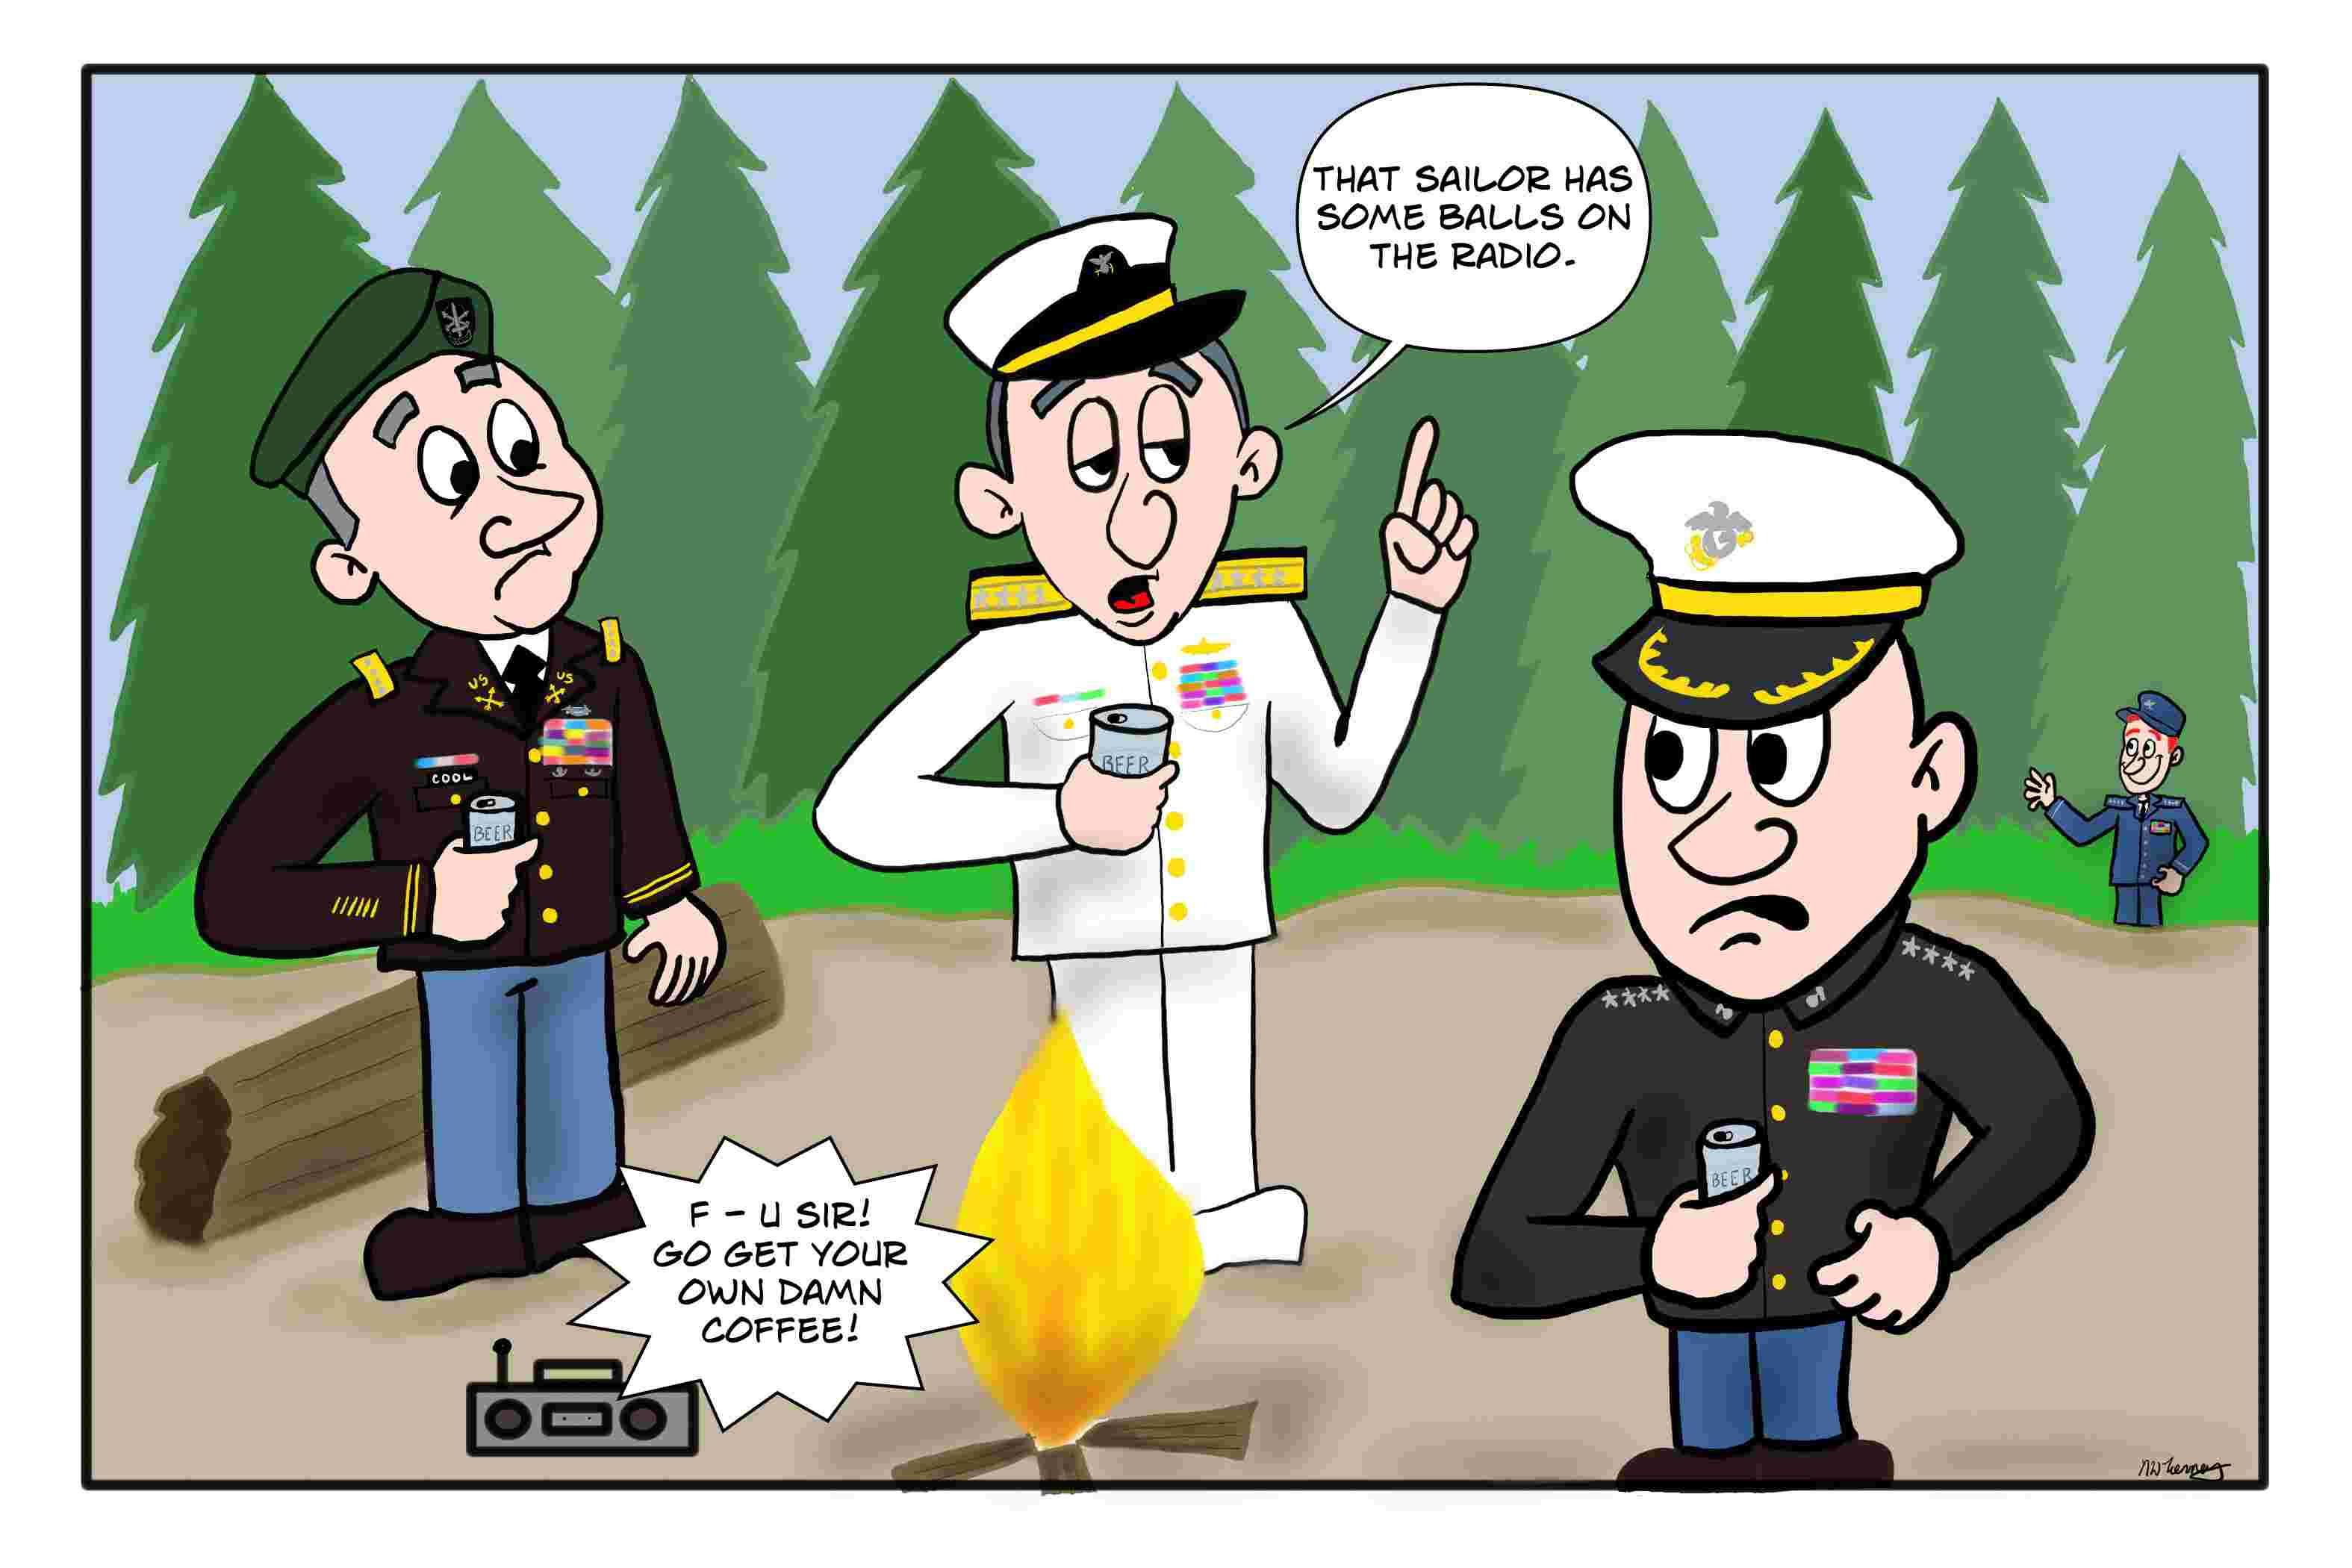 navy-sailor-balls